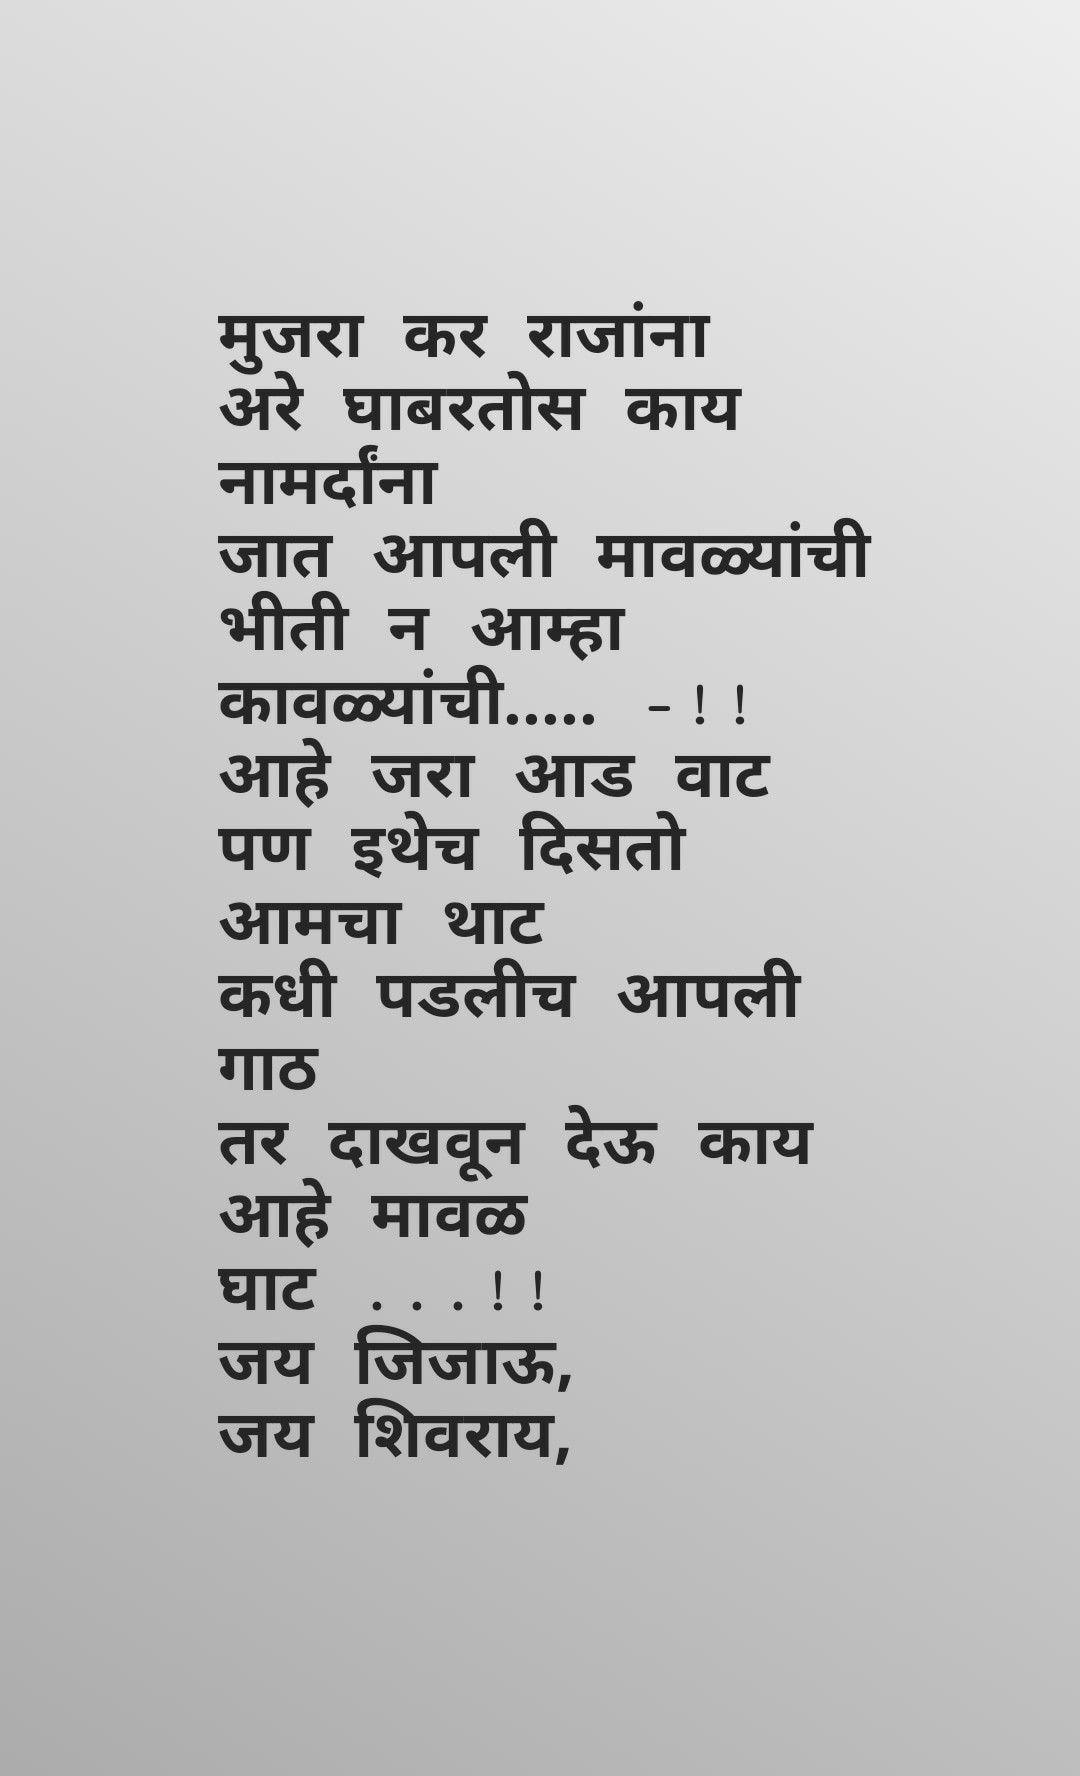 Pin by Roshan Rock on आमचं दैवत | Shiva shakti, Shiva tattoo